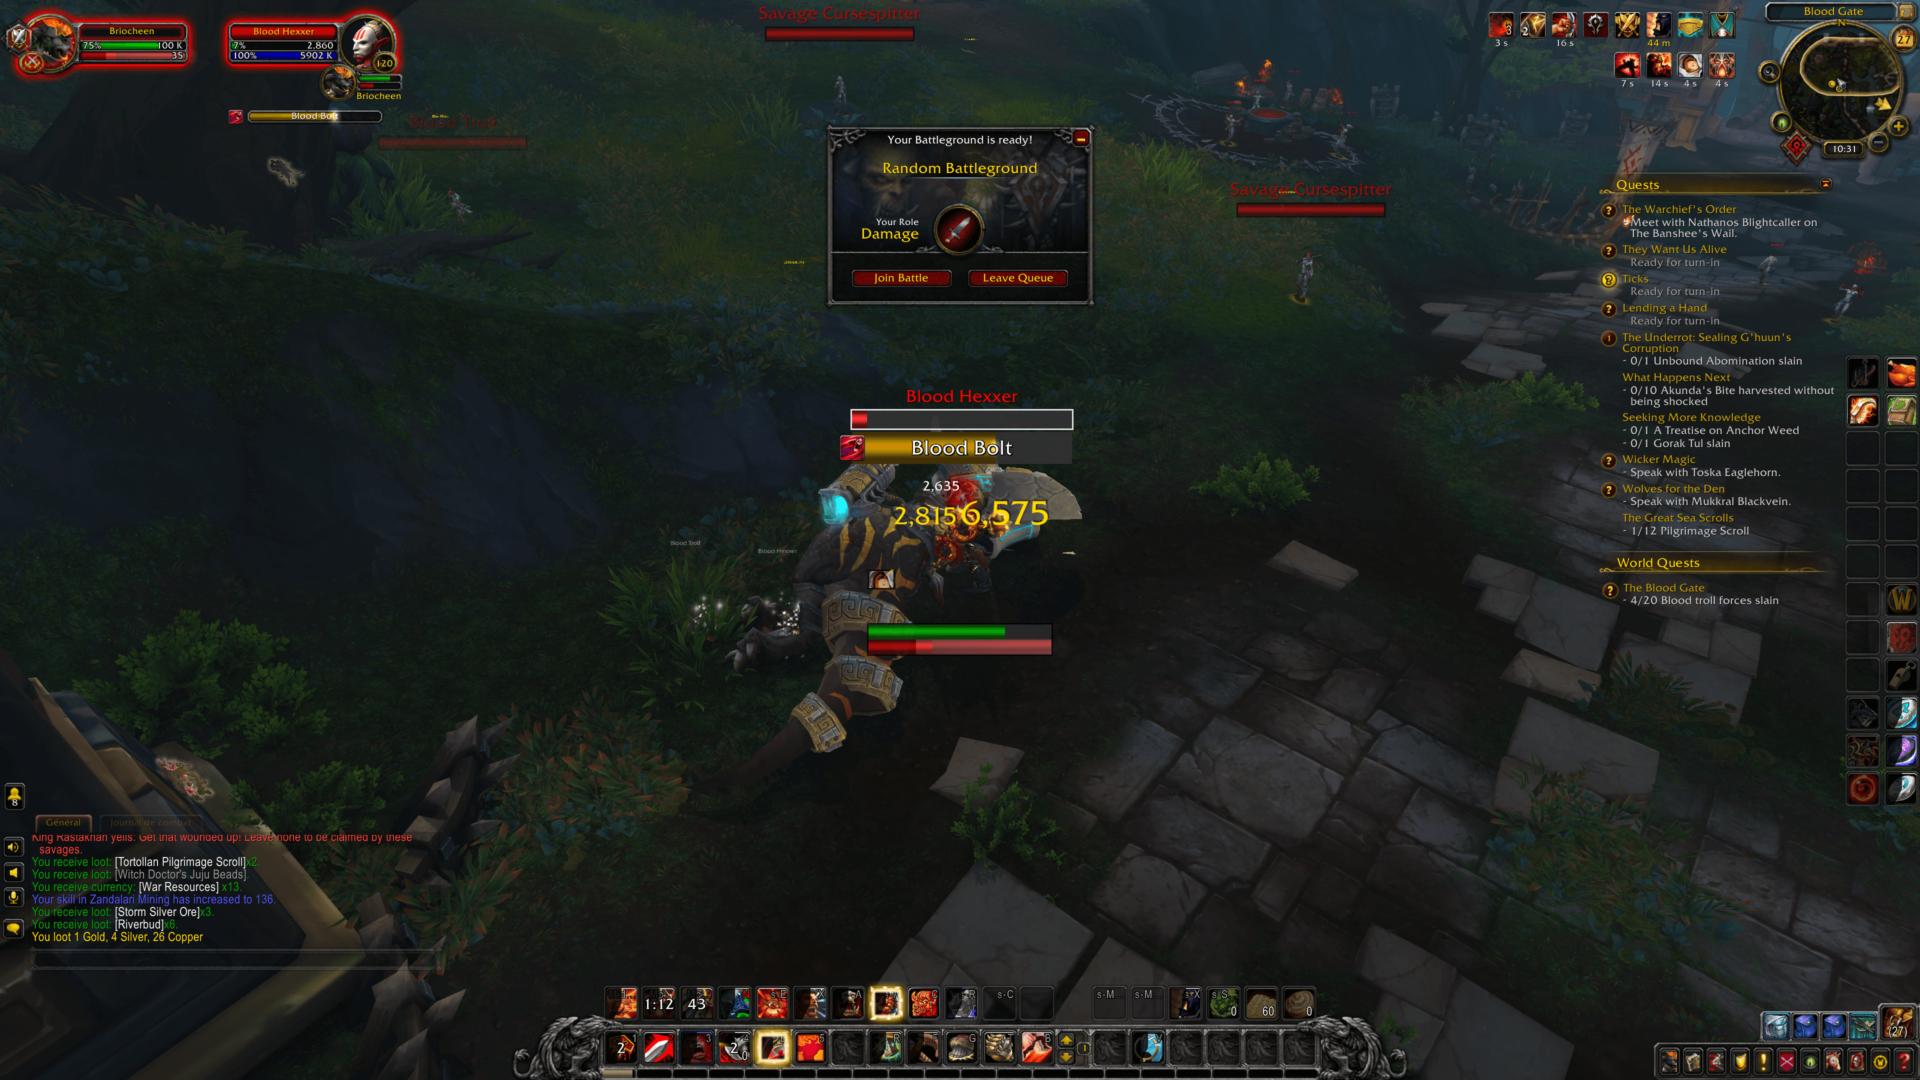 Join battle screenshot of World of Warcraft video game interface.